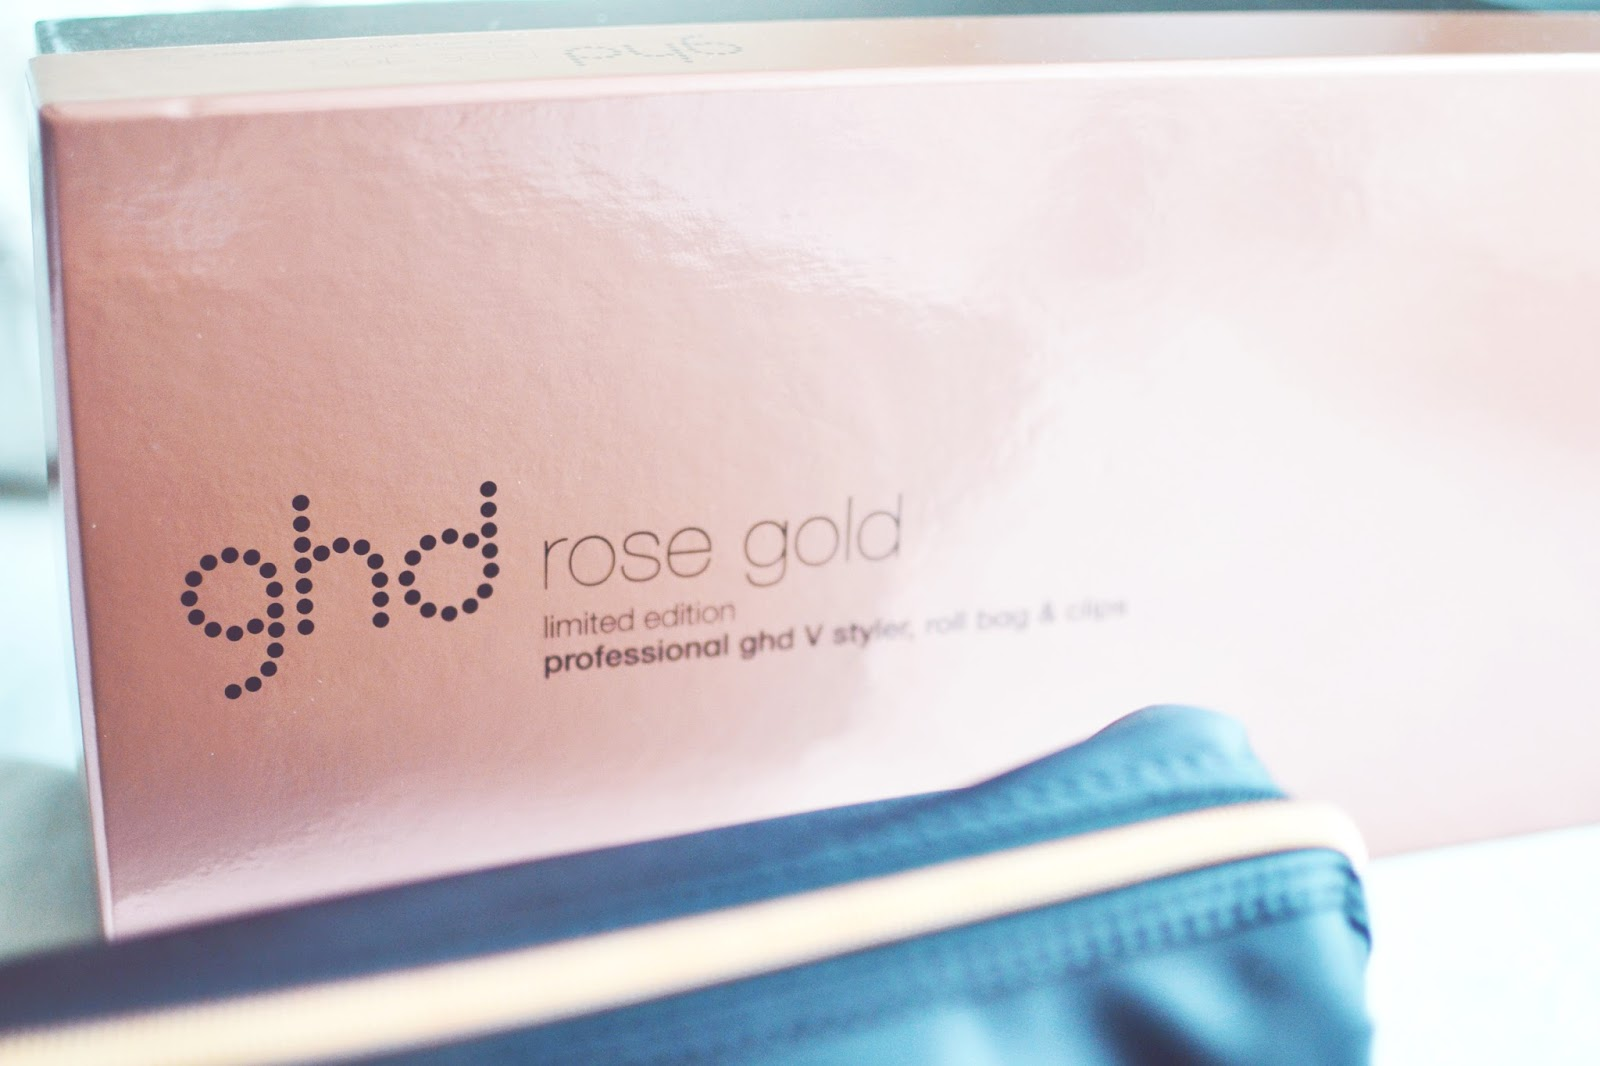 ghd hair straighteners, ghd rose gold straighteners